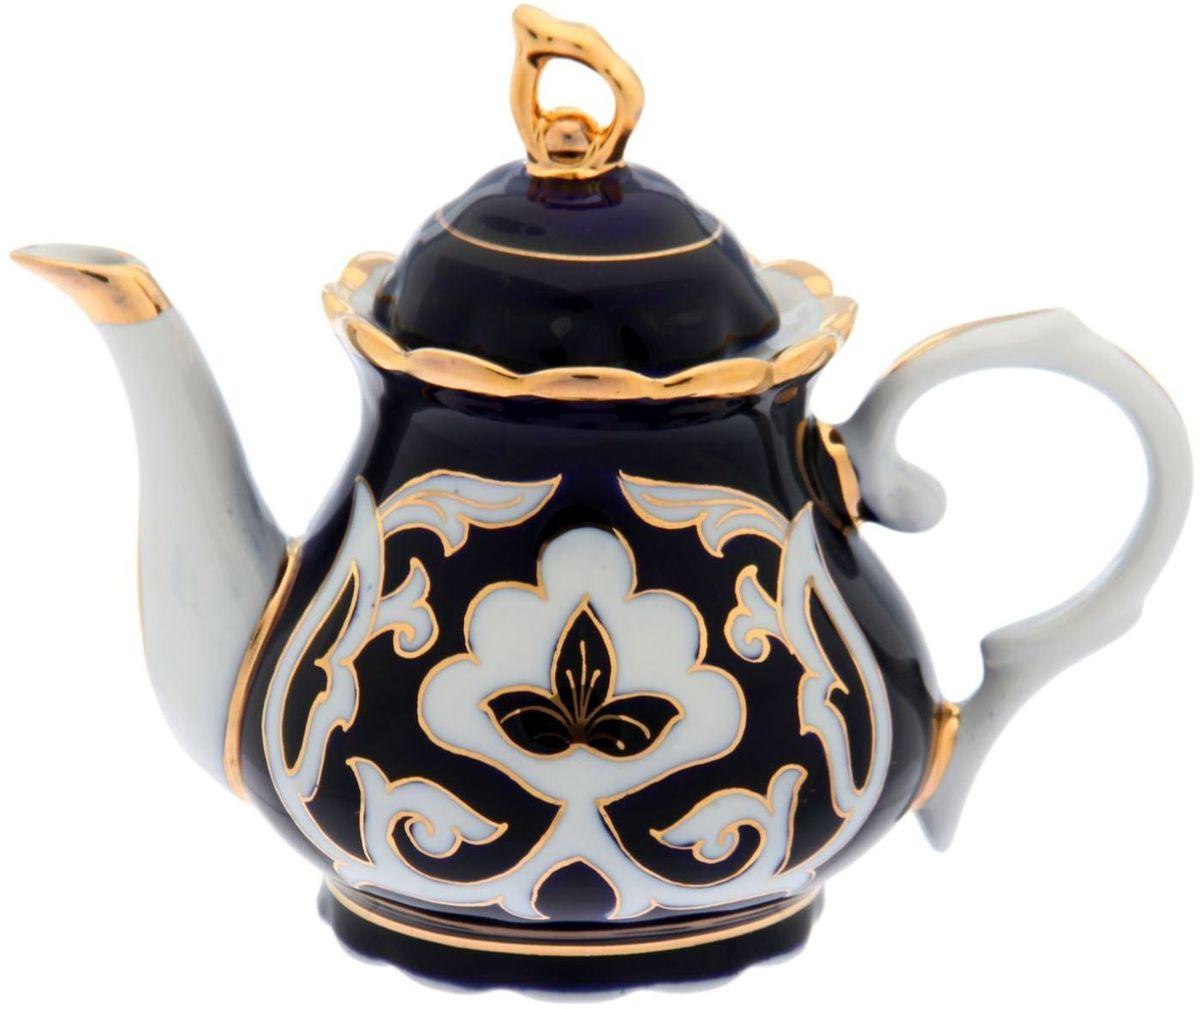 Фото - Чайник заварочный Turon Porcelain Пахта, цвет: синий, белый, золотистый, 800 мл тарелка turon porcelain атлас цвет белый синий золотистый диаметр 22 5 см